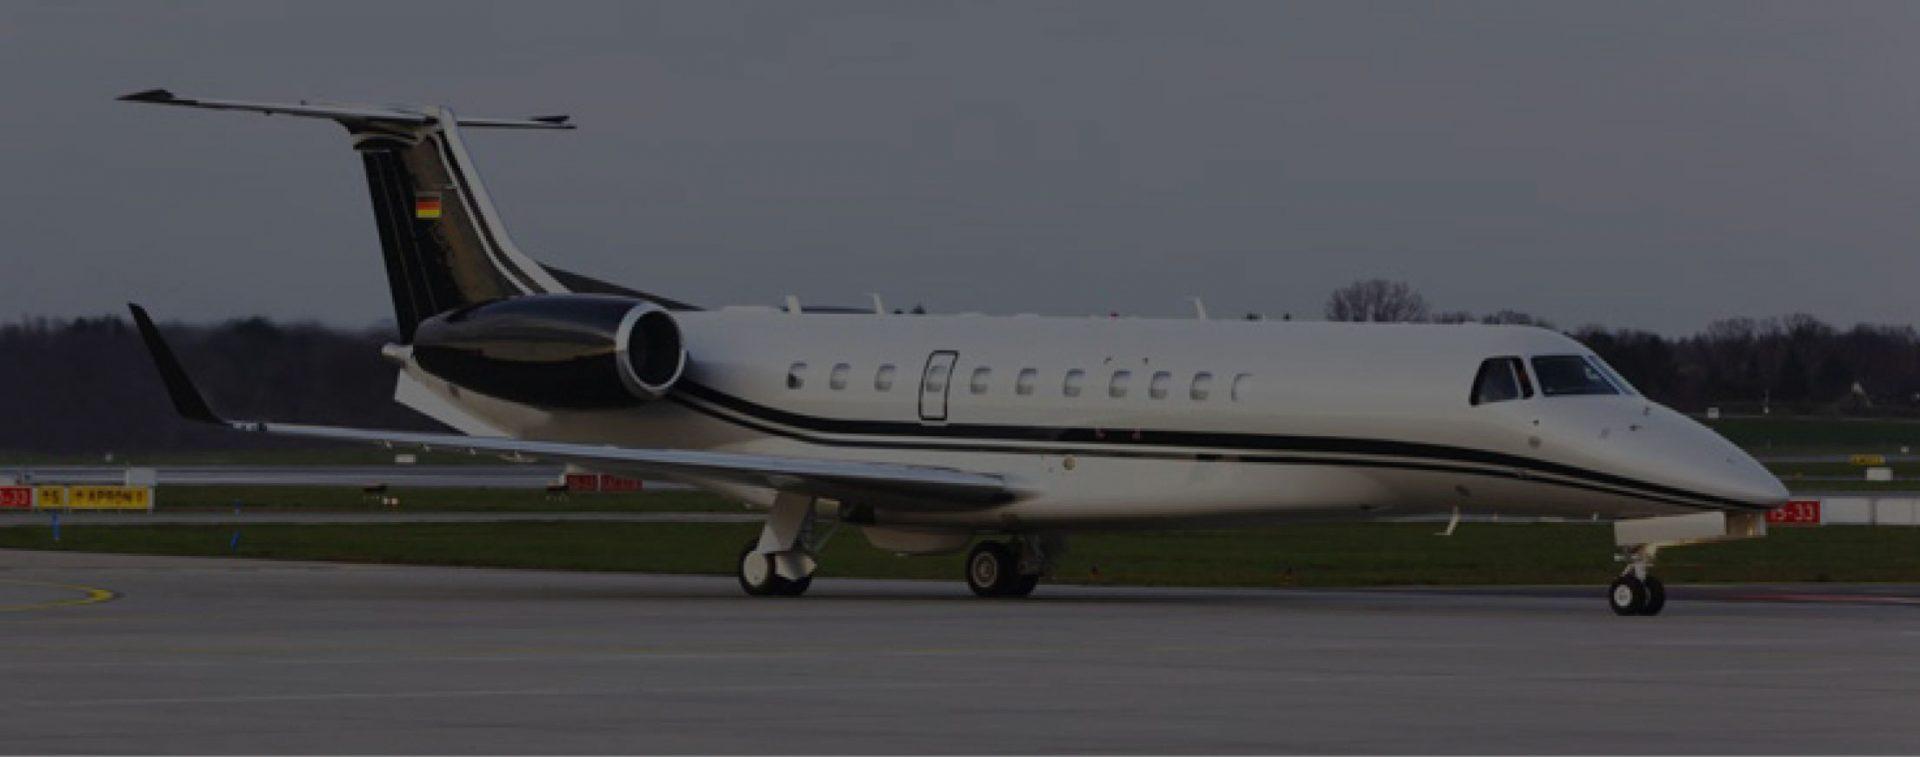 Jet Header D AZUR